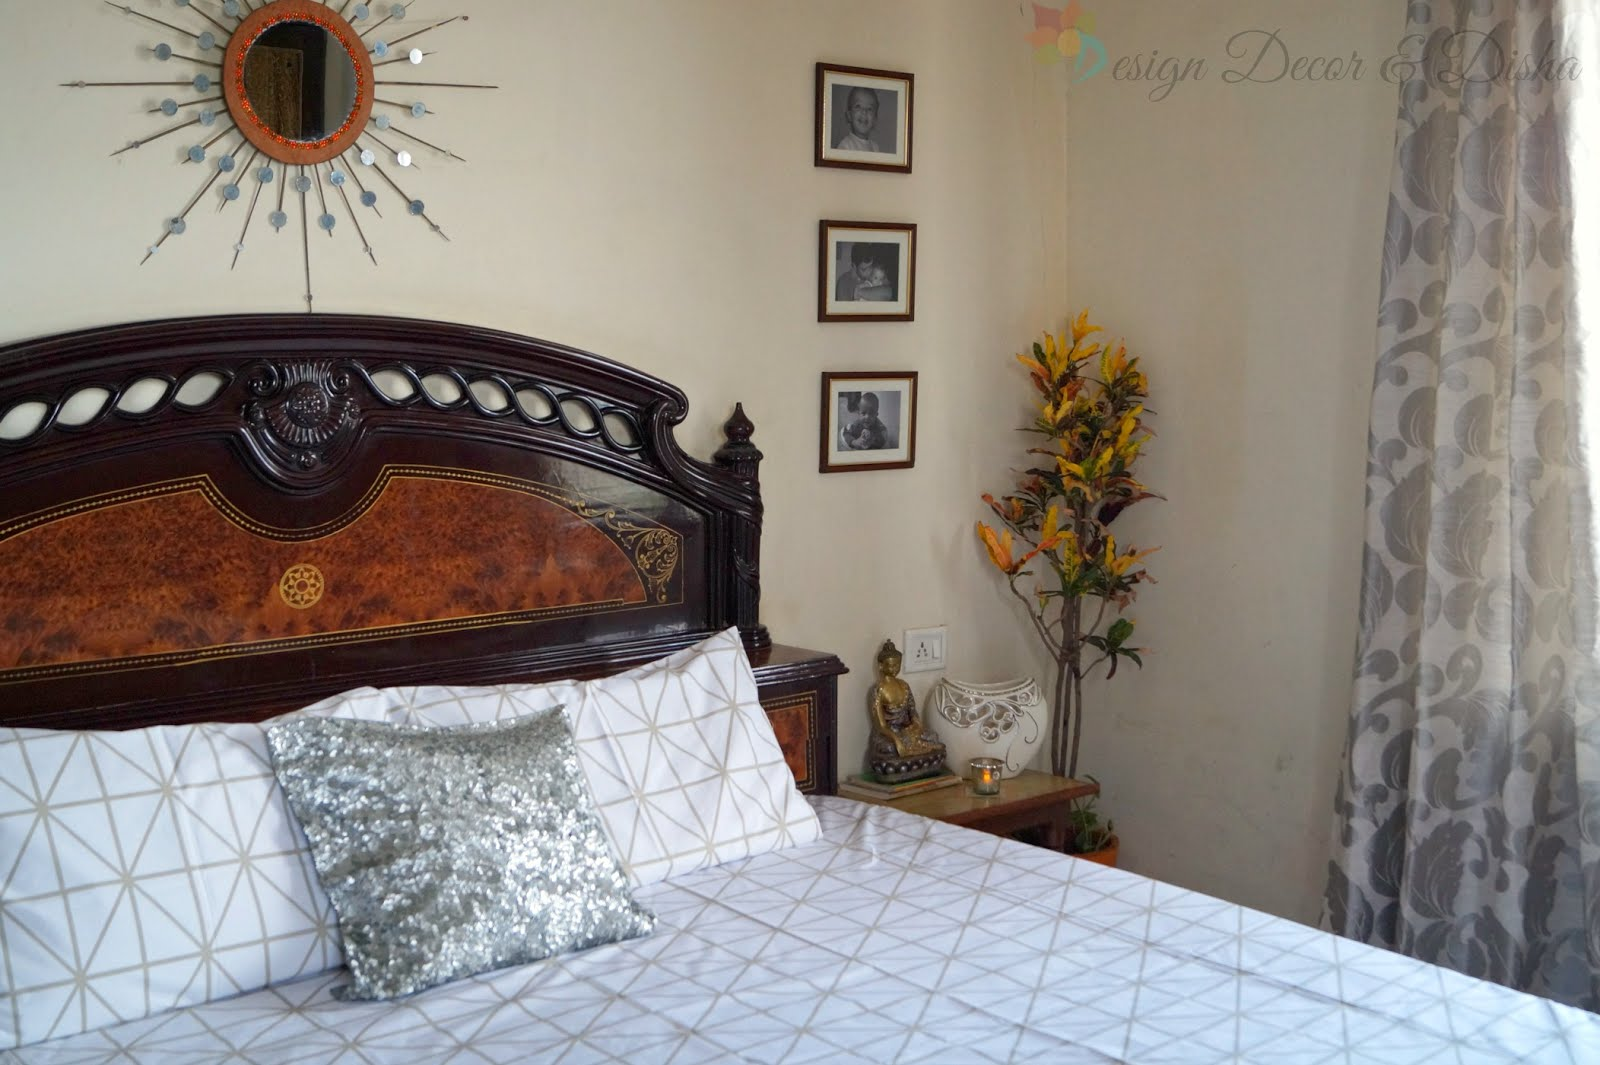 Design decor disha soft furnishings play an important for Soft furnishings online